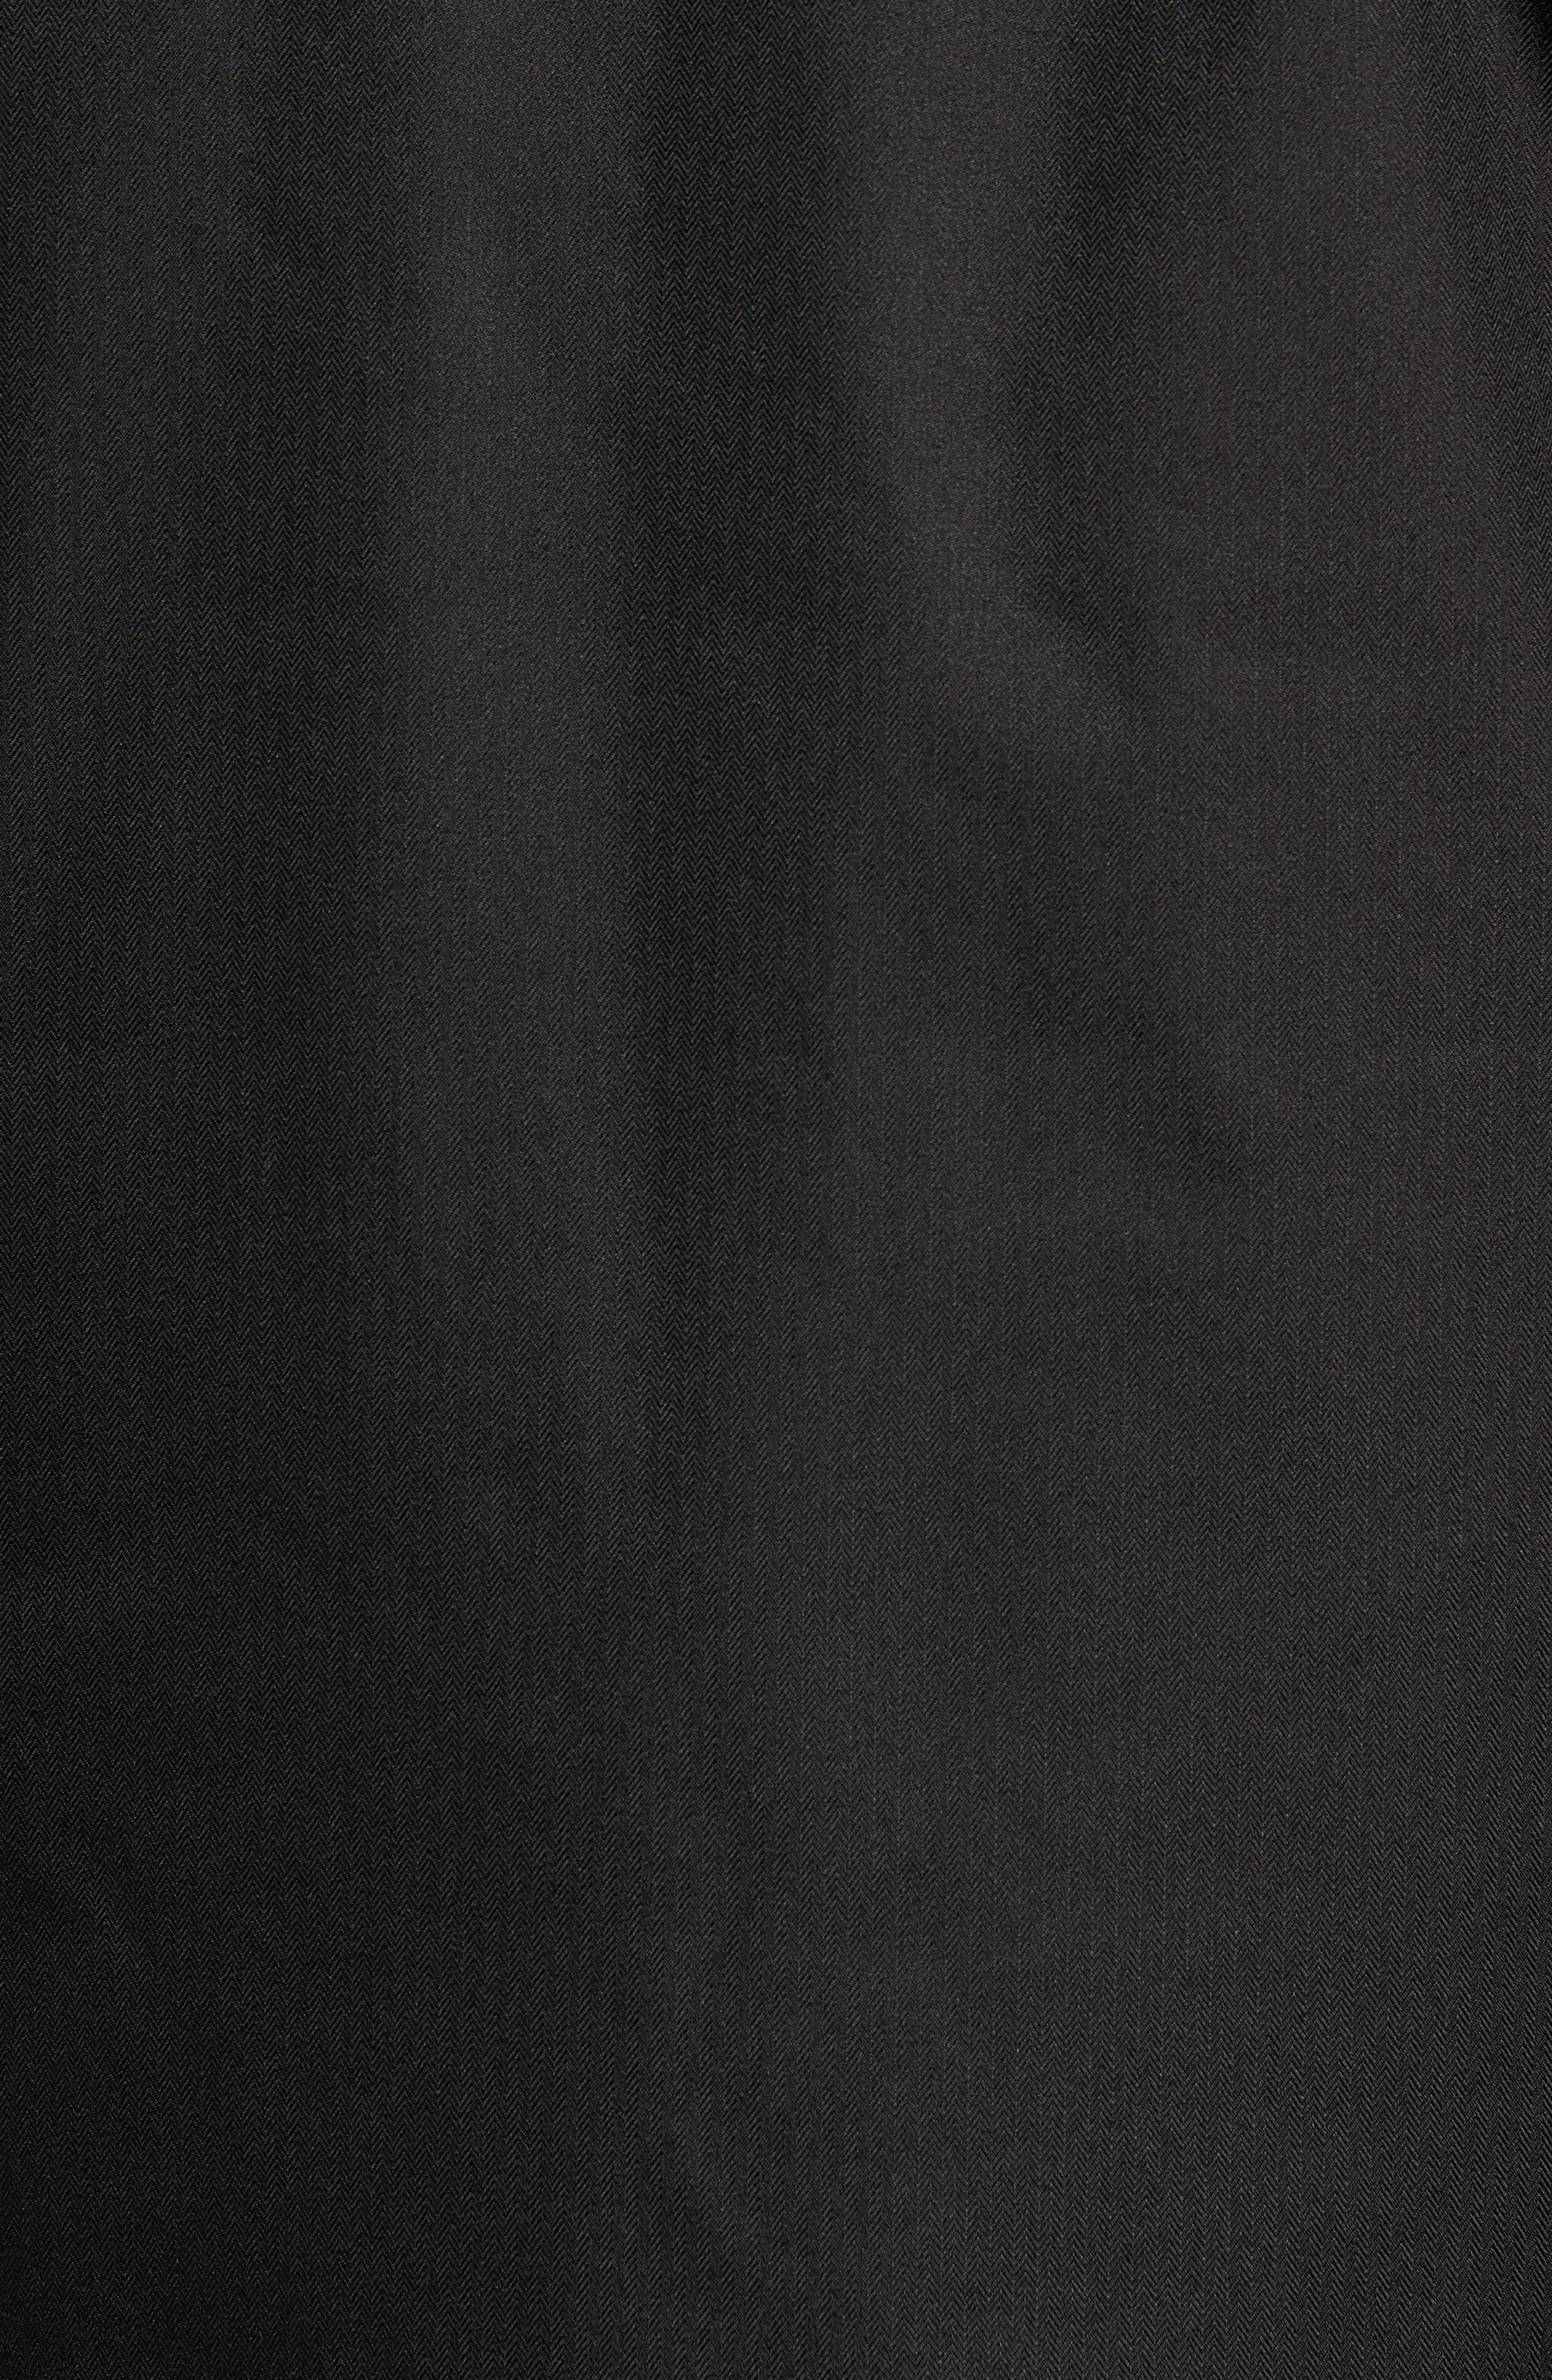 Gatekeeper Waterproof Jacket,                             Alternate thumbnail 7, color,                             TNF BLACK/TNF BLACK